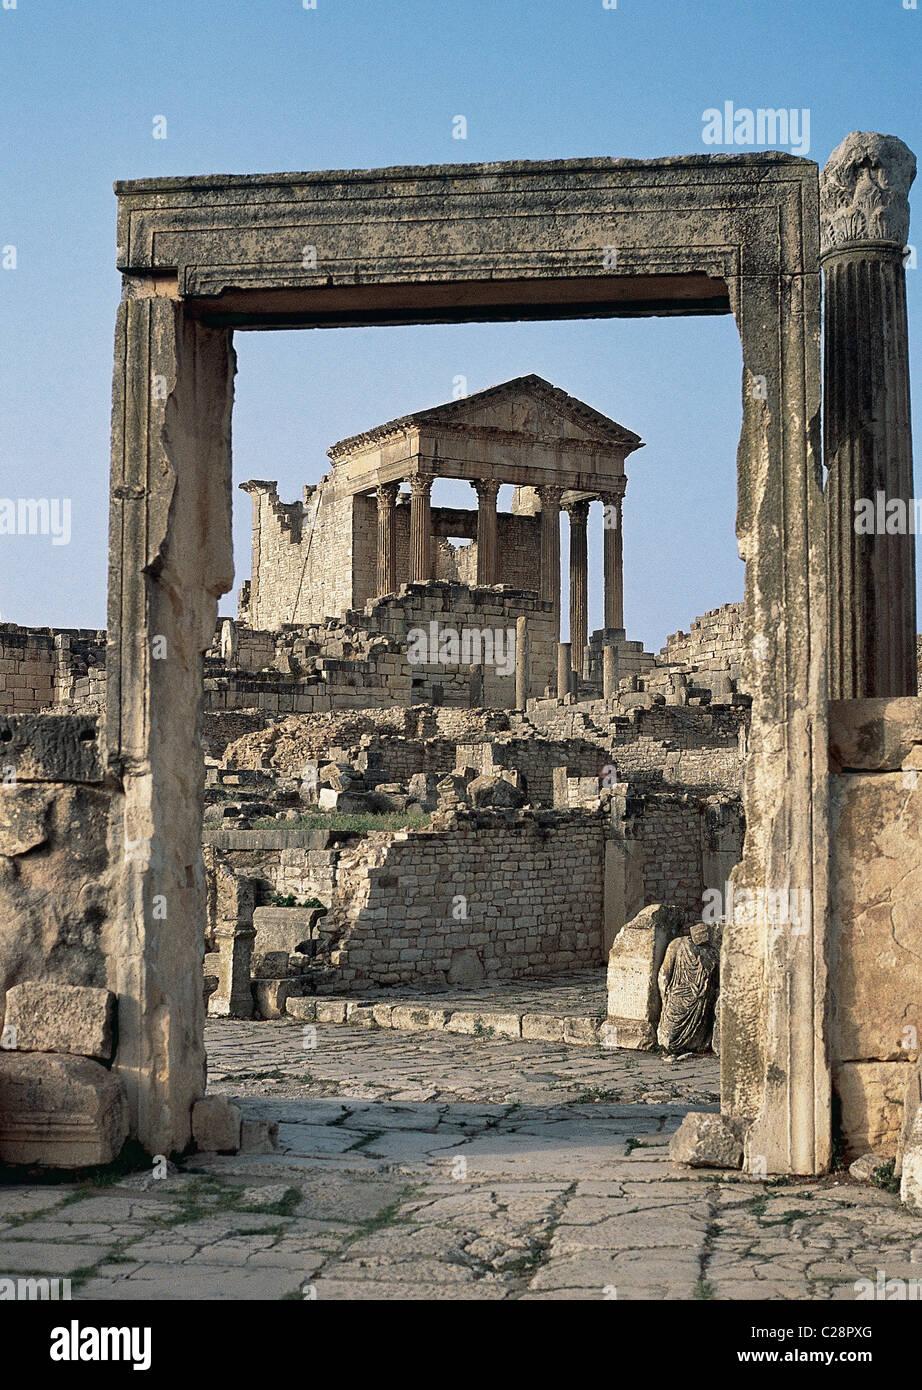 Roman Art. Tunisia. Dougga. The Capitol dedicated to Jupiter, Juno and Minerva. - Stock Image